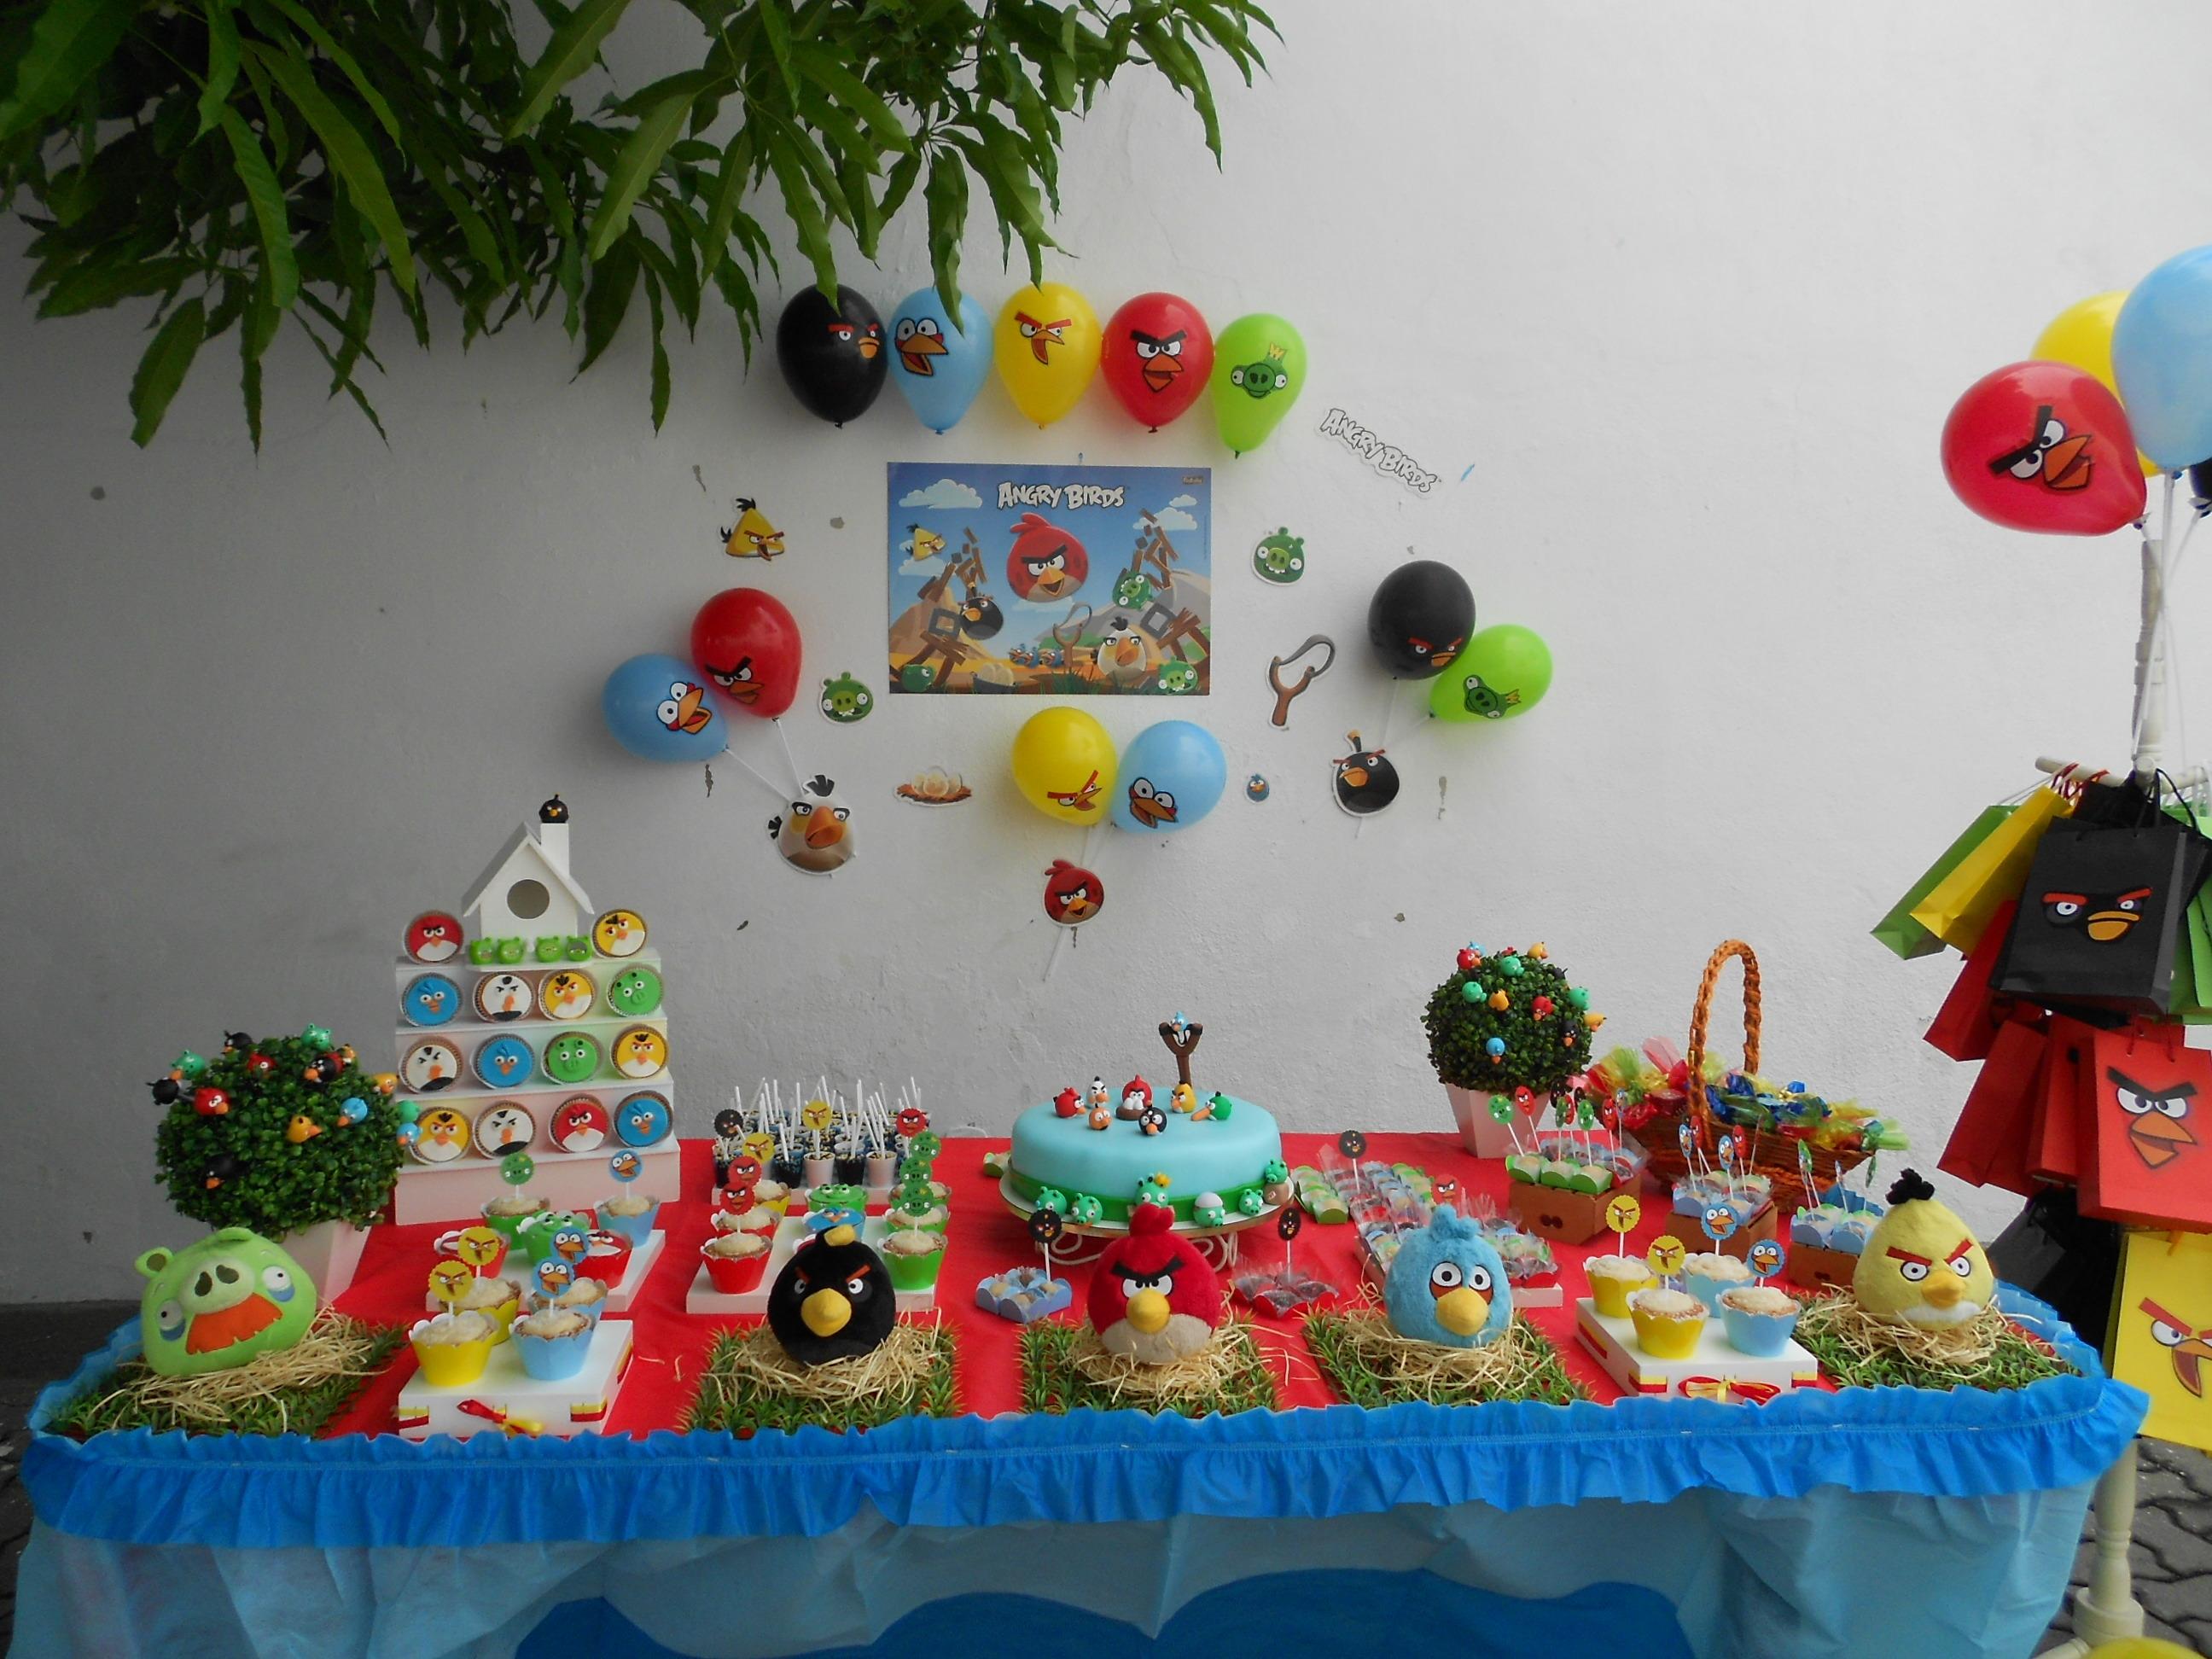 decoracao festa simples:decoracao simples angry birds decoracao simples angry birds decoracao